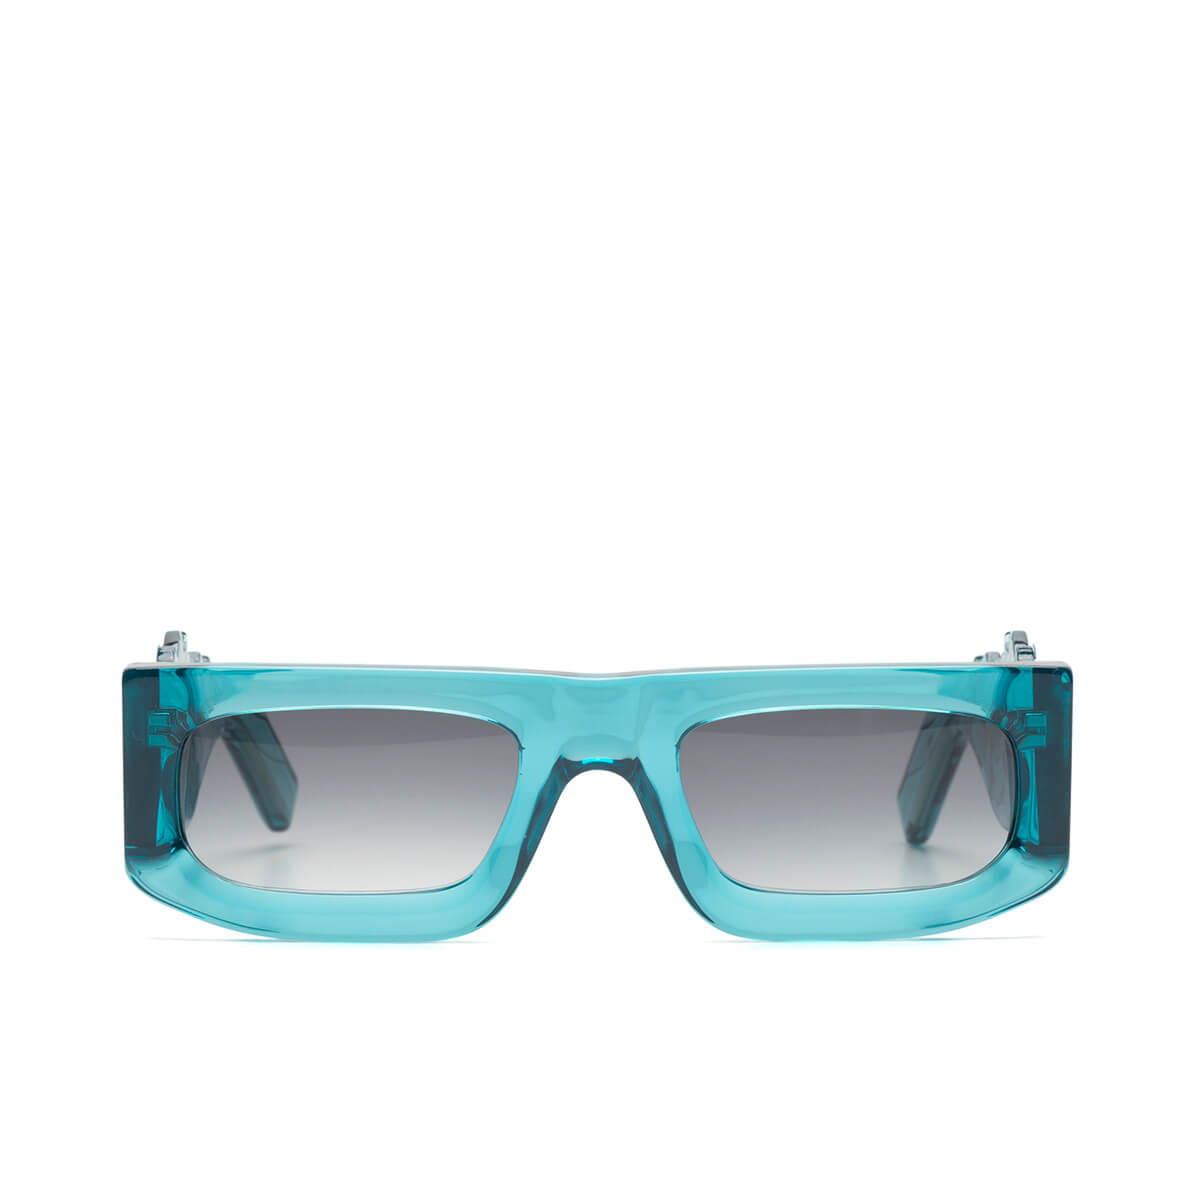 Evangelisti World Drop1 Sunglasses